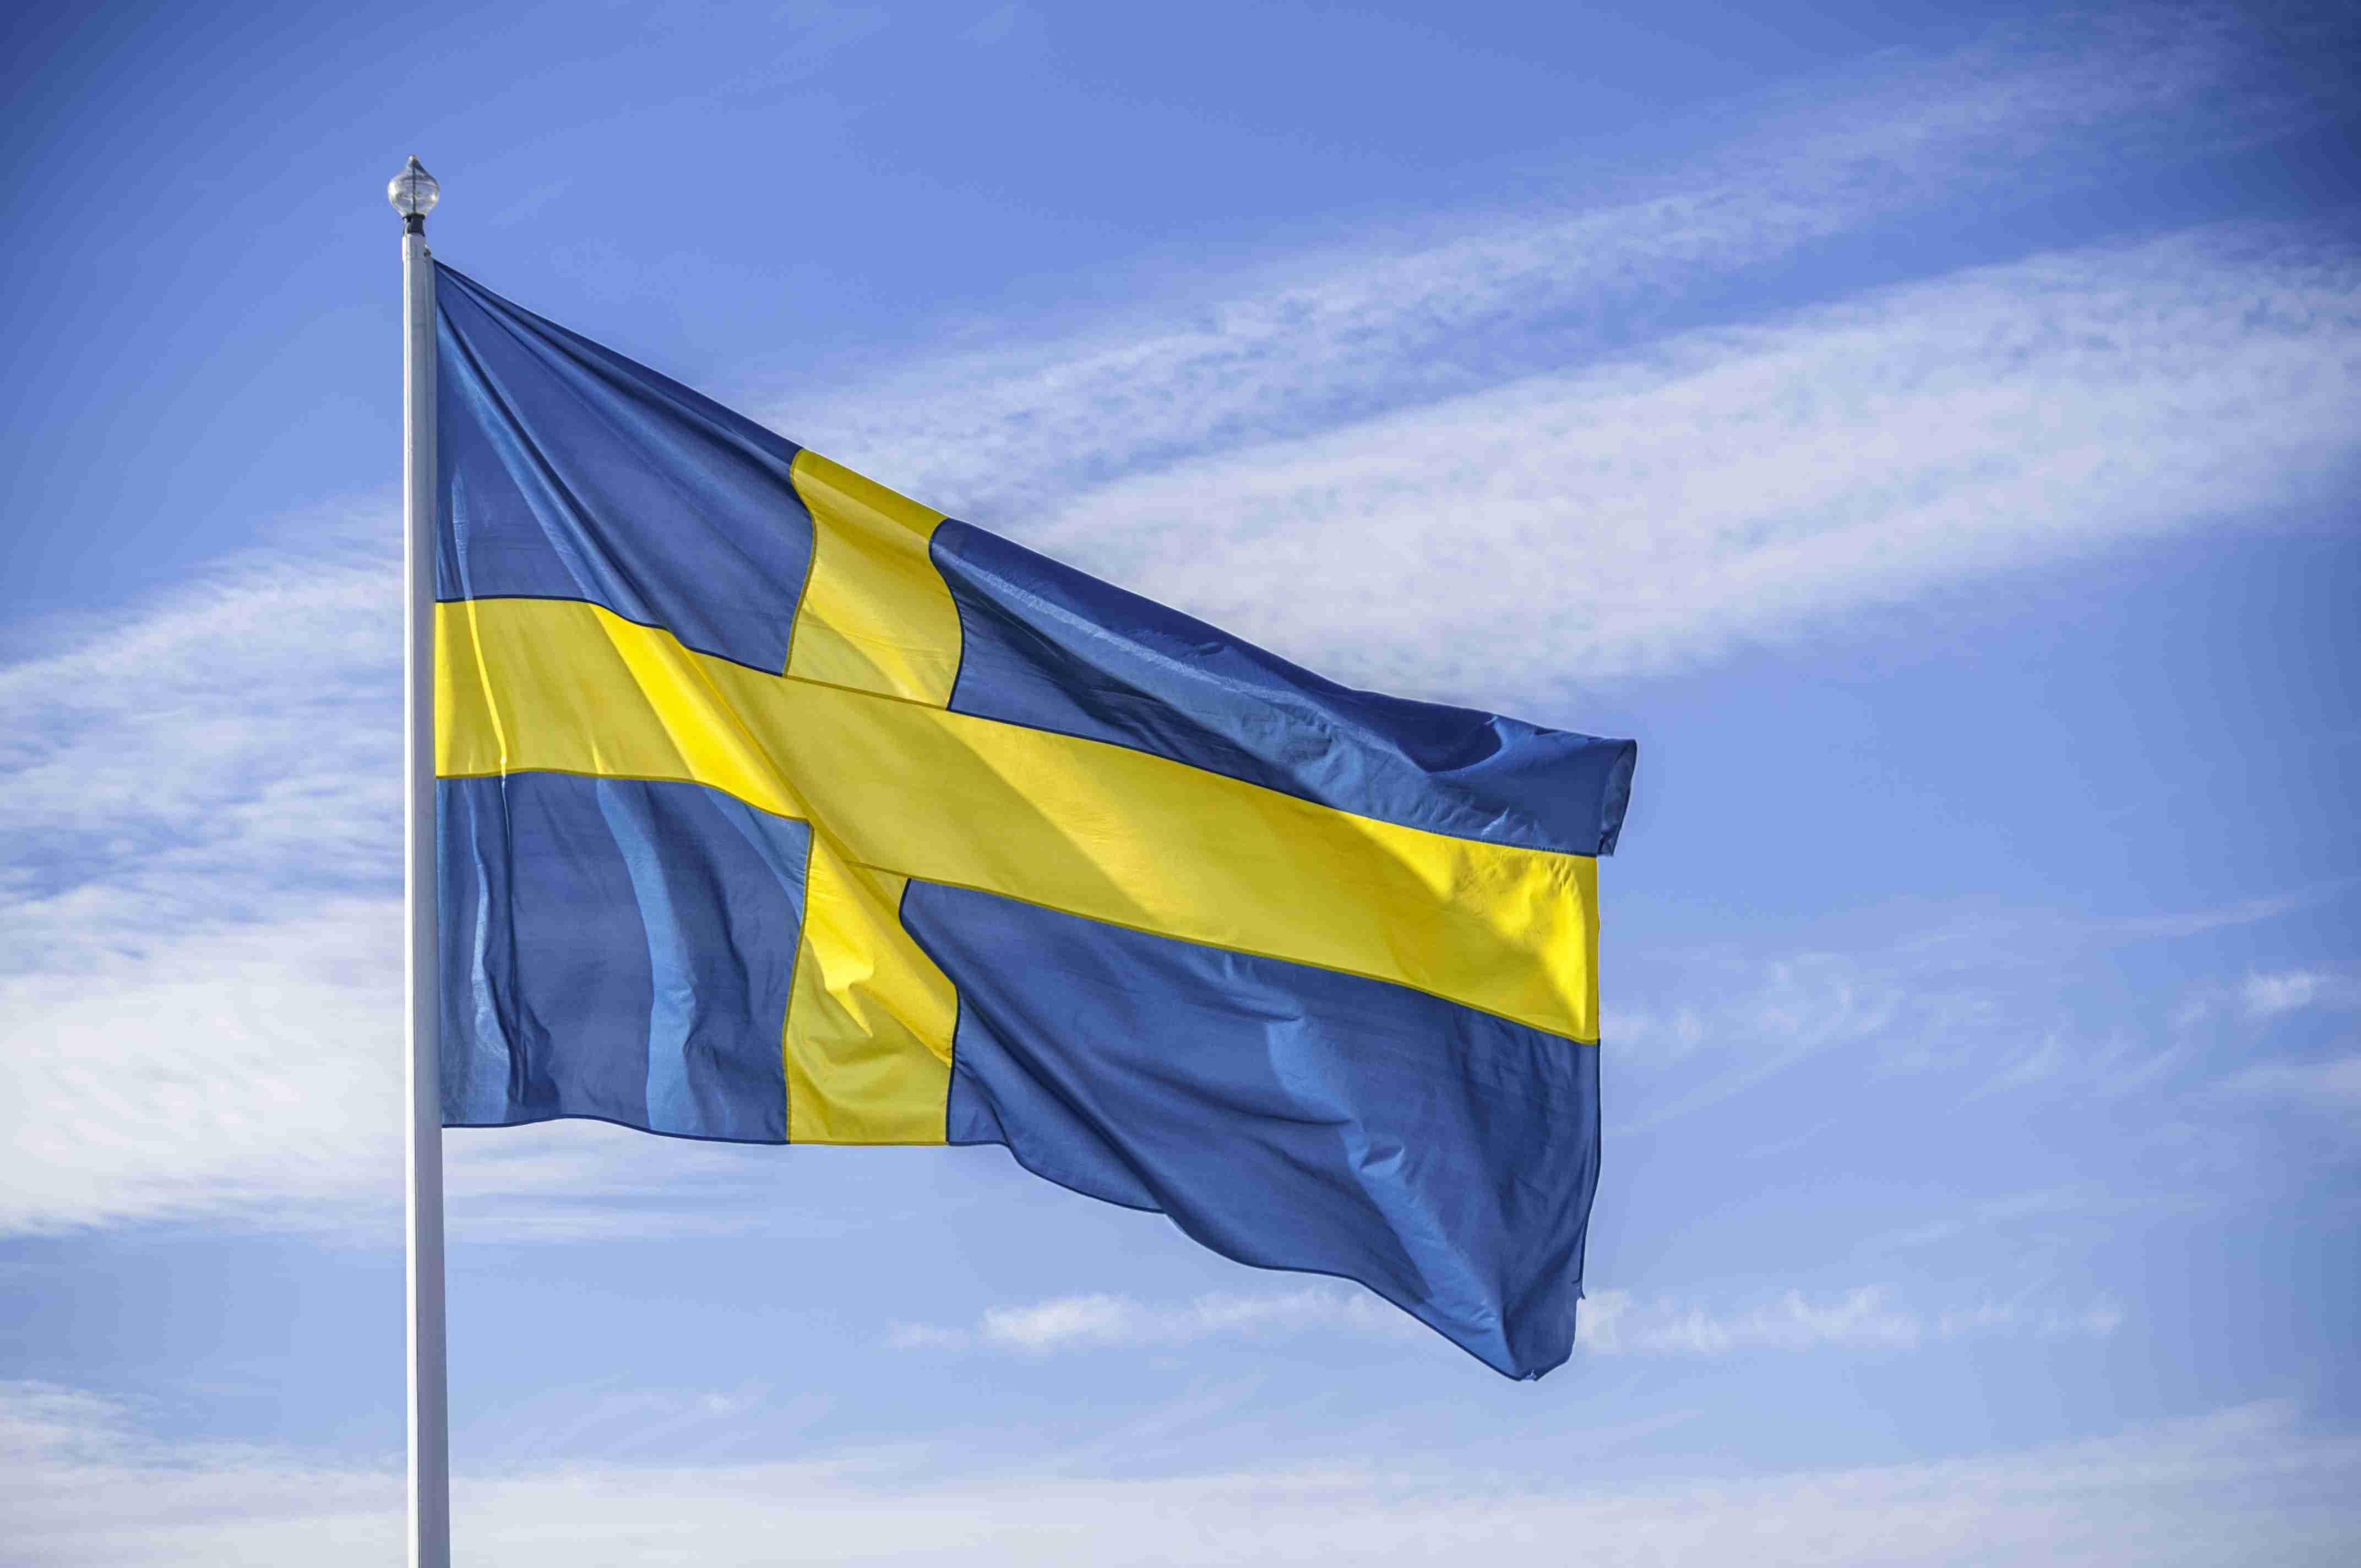 Swedish nation flag in sunlight